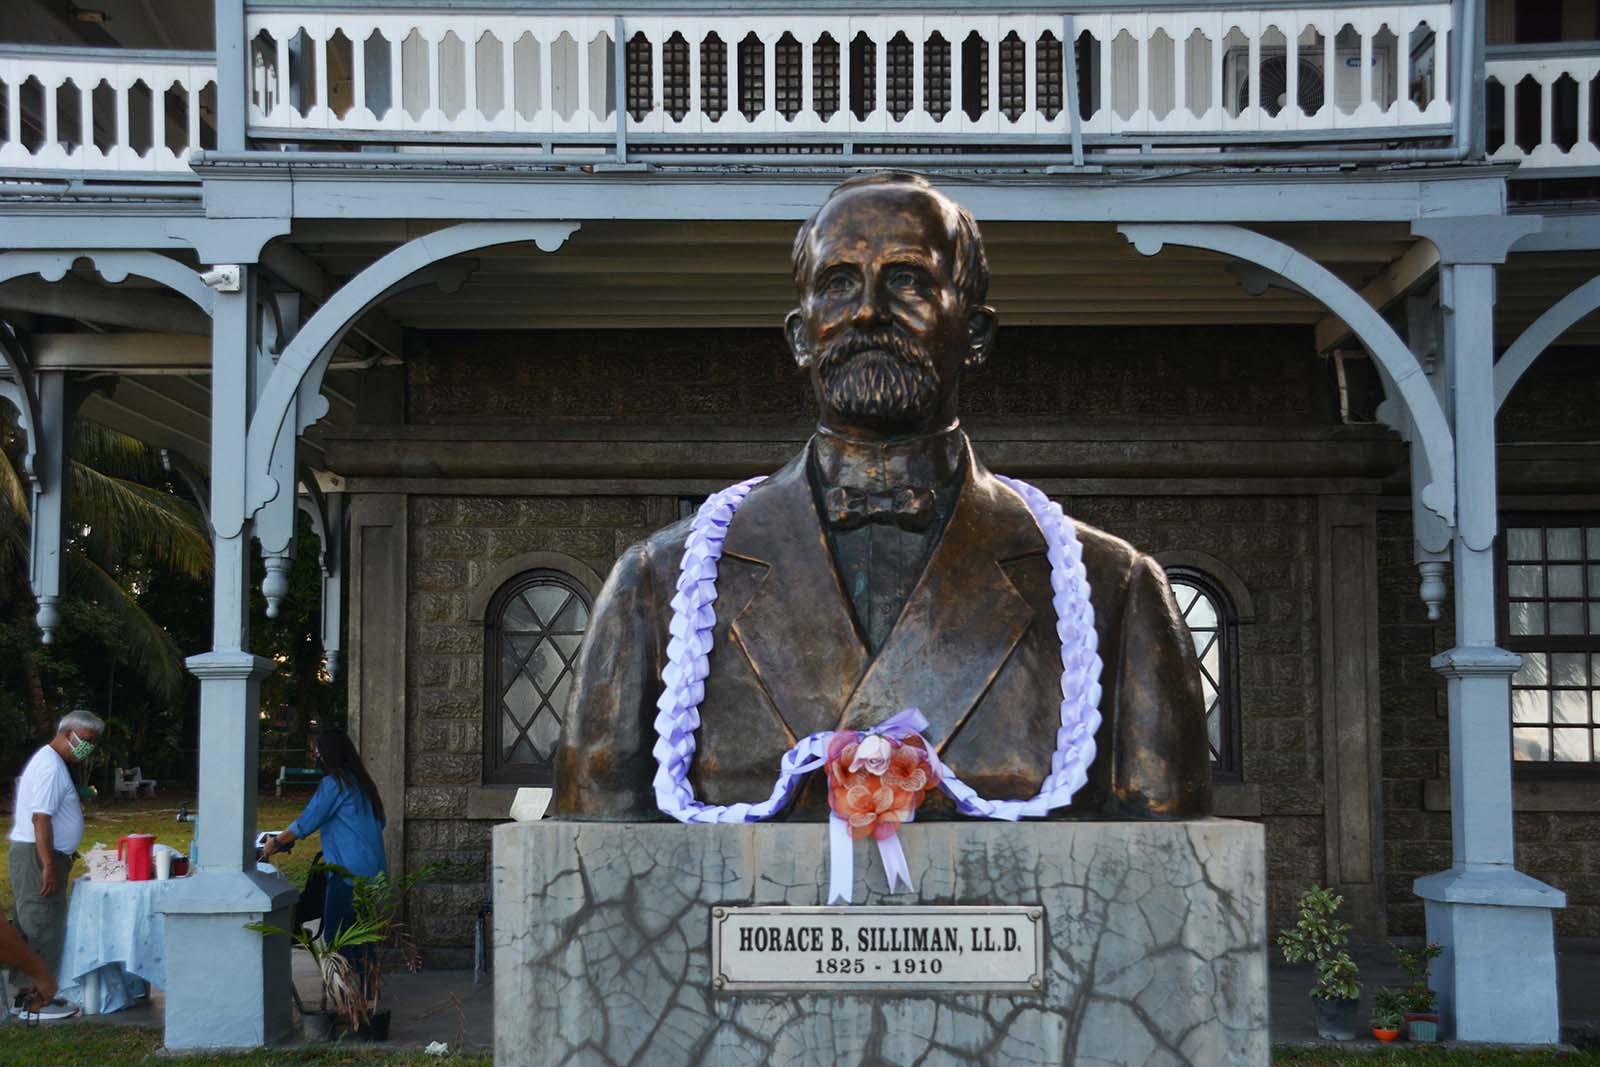 SU commemorates Dr. Horace B. Silliman's 110th death anniversary